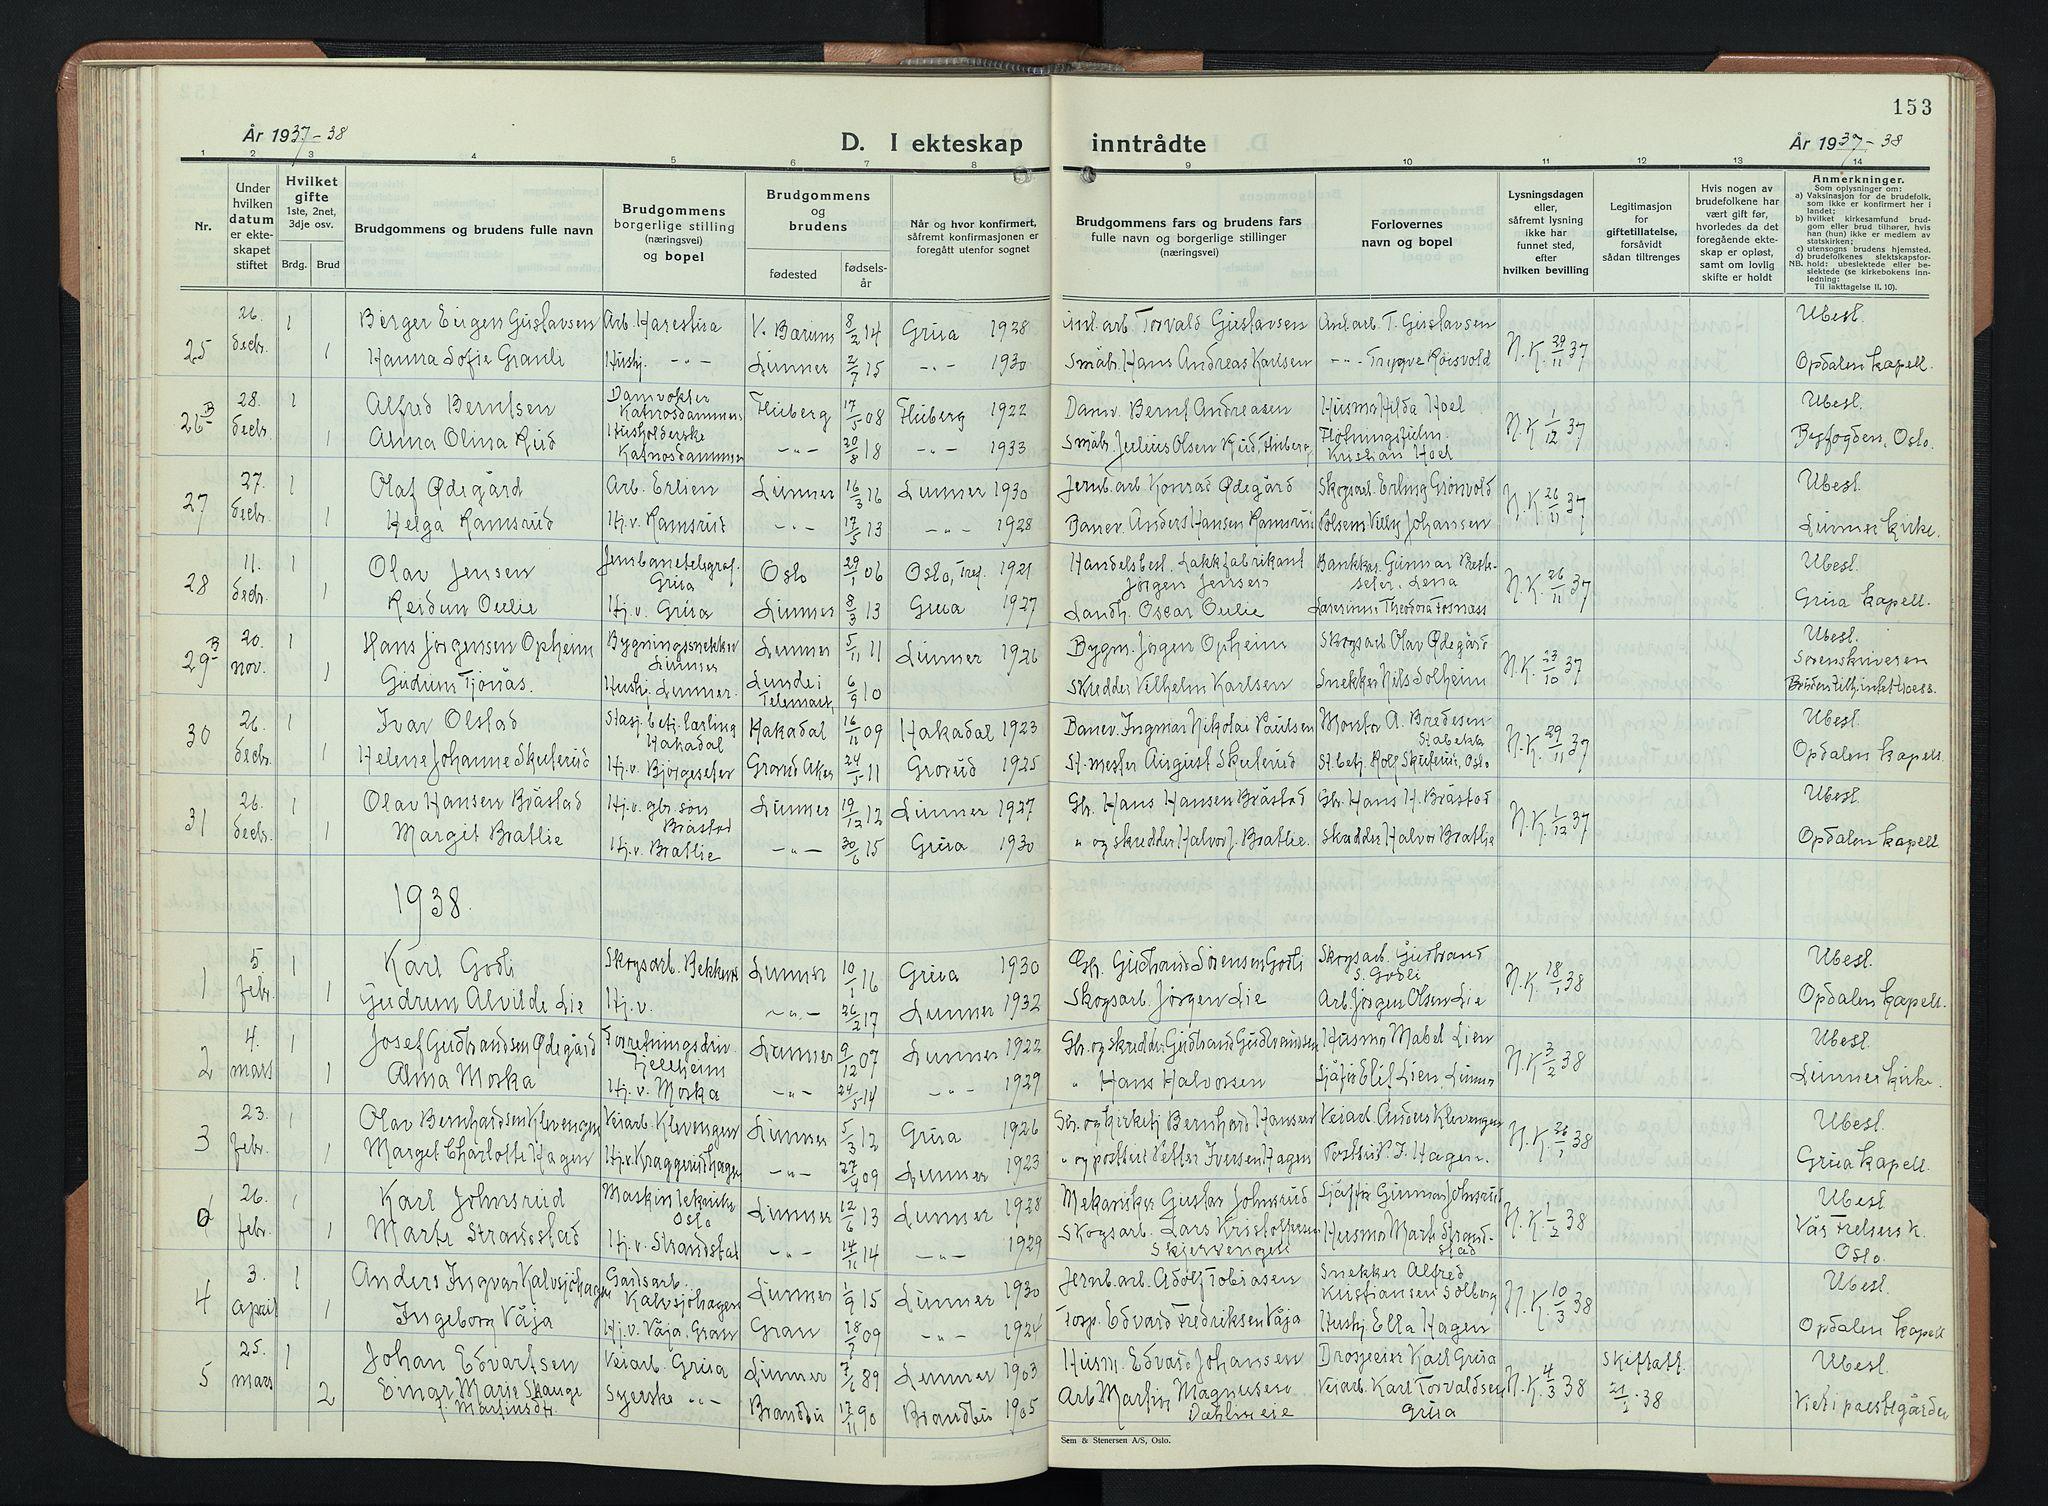 SAH, Lunner prestekontor, H/Ha/Hab/L0003: Klokkerbok nr. 3, 1933-1945, s. 153